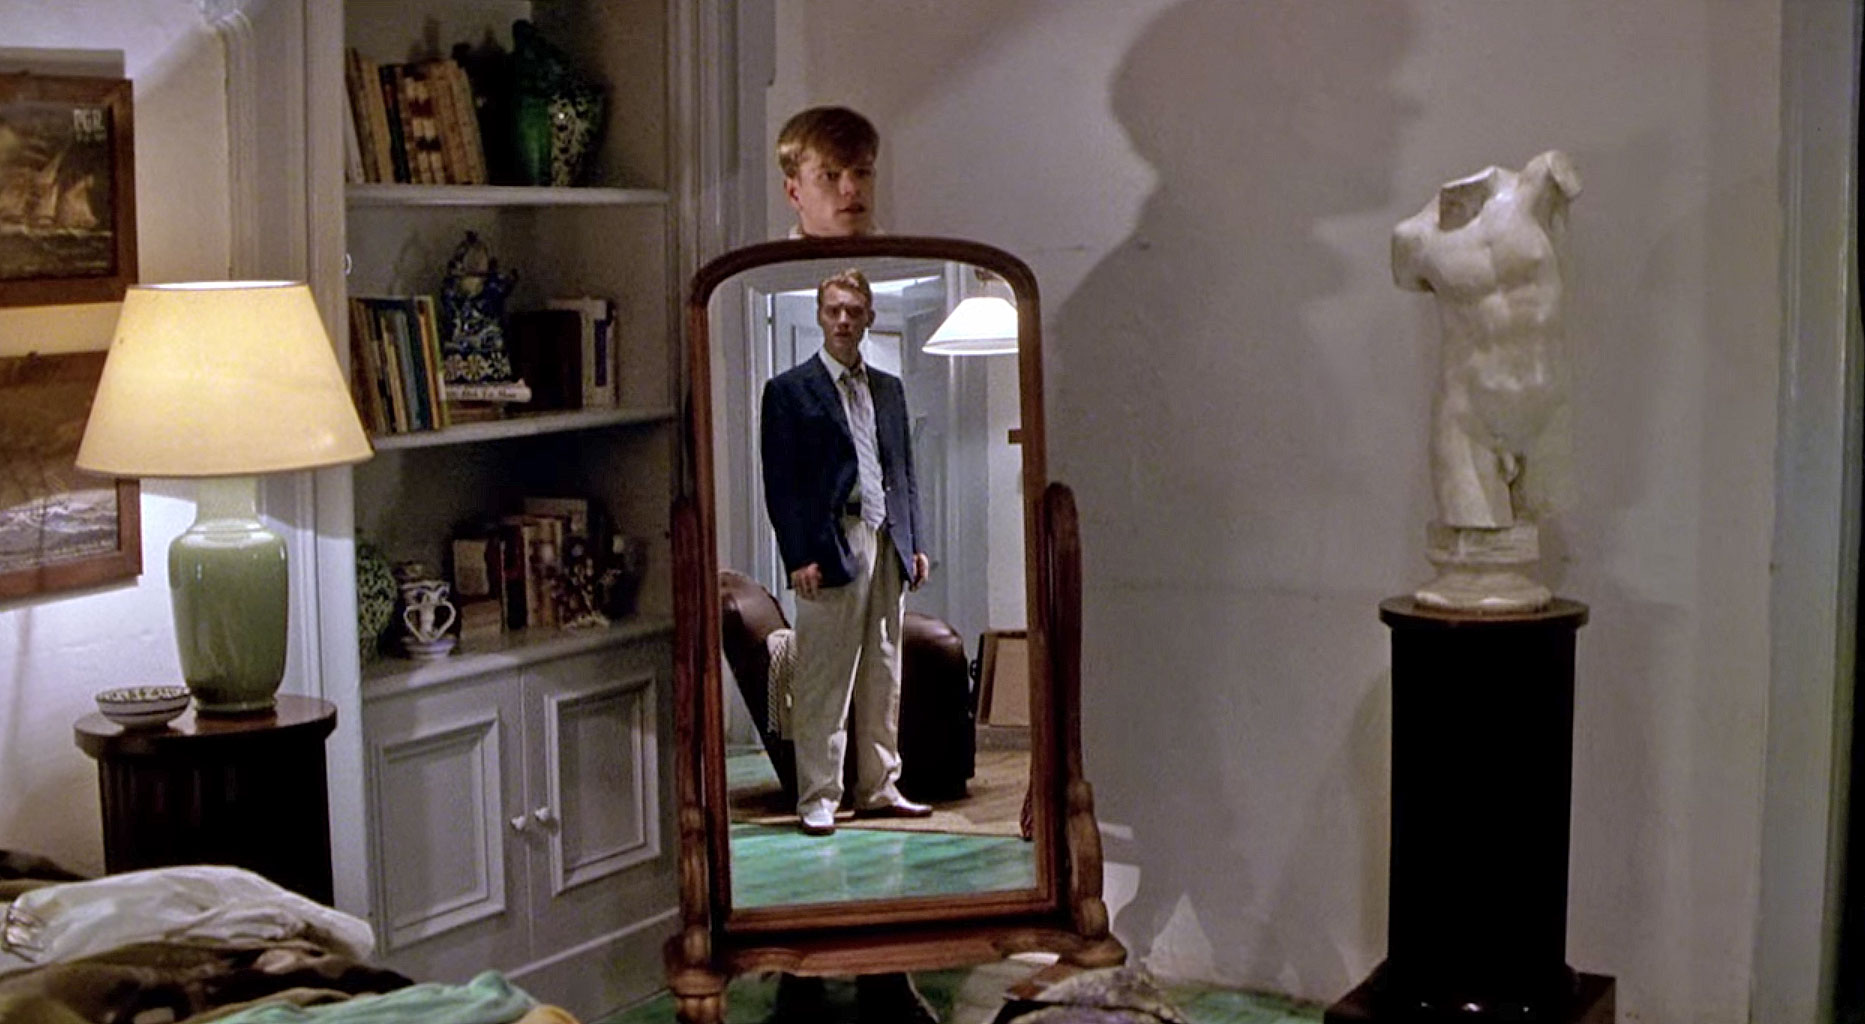 The Talented Mr Ripley mirror scene